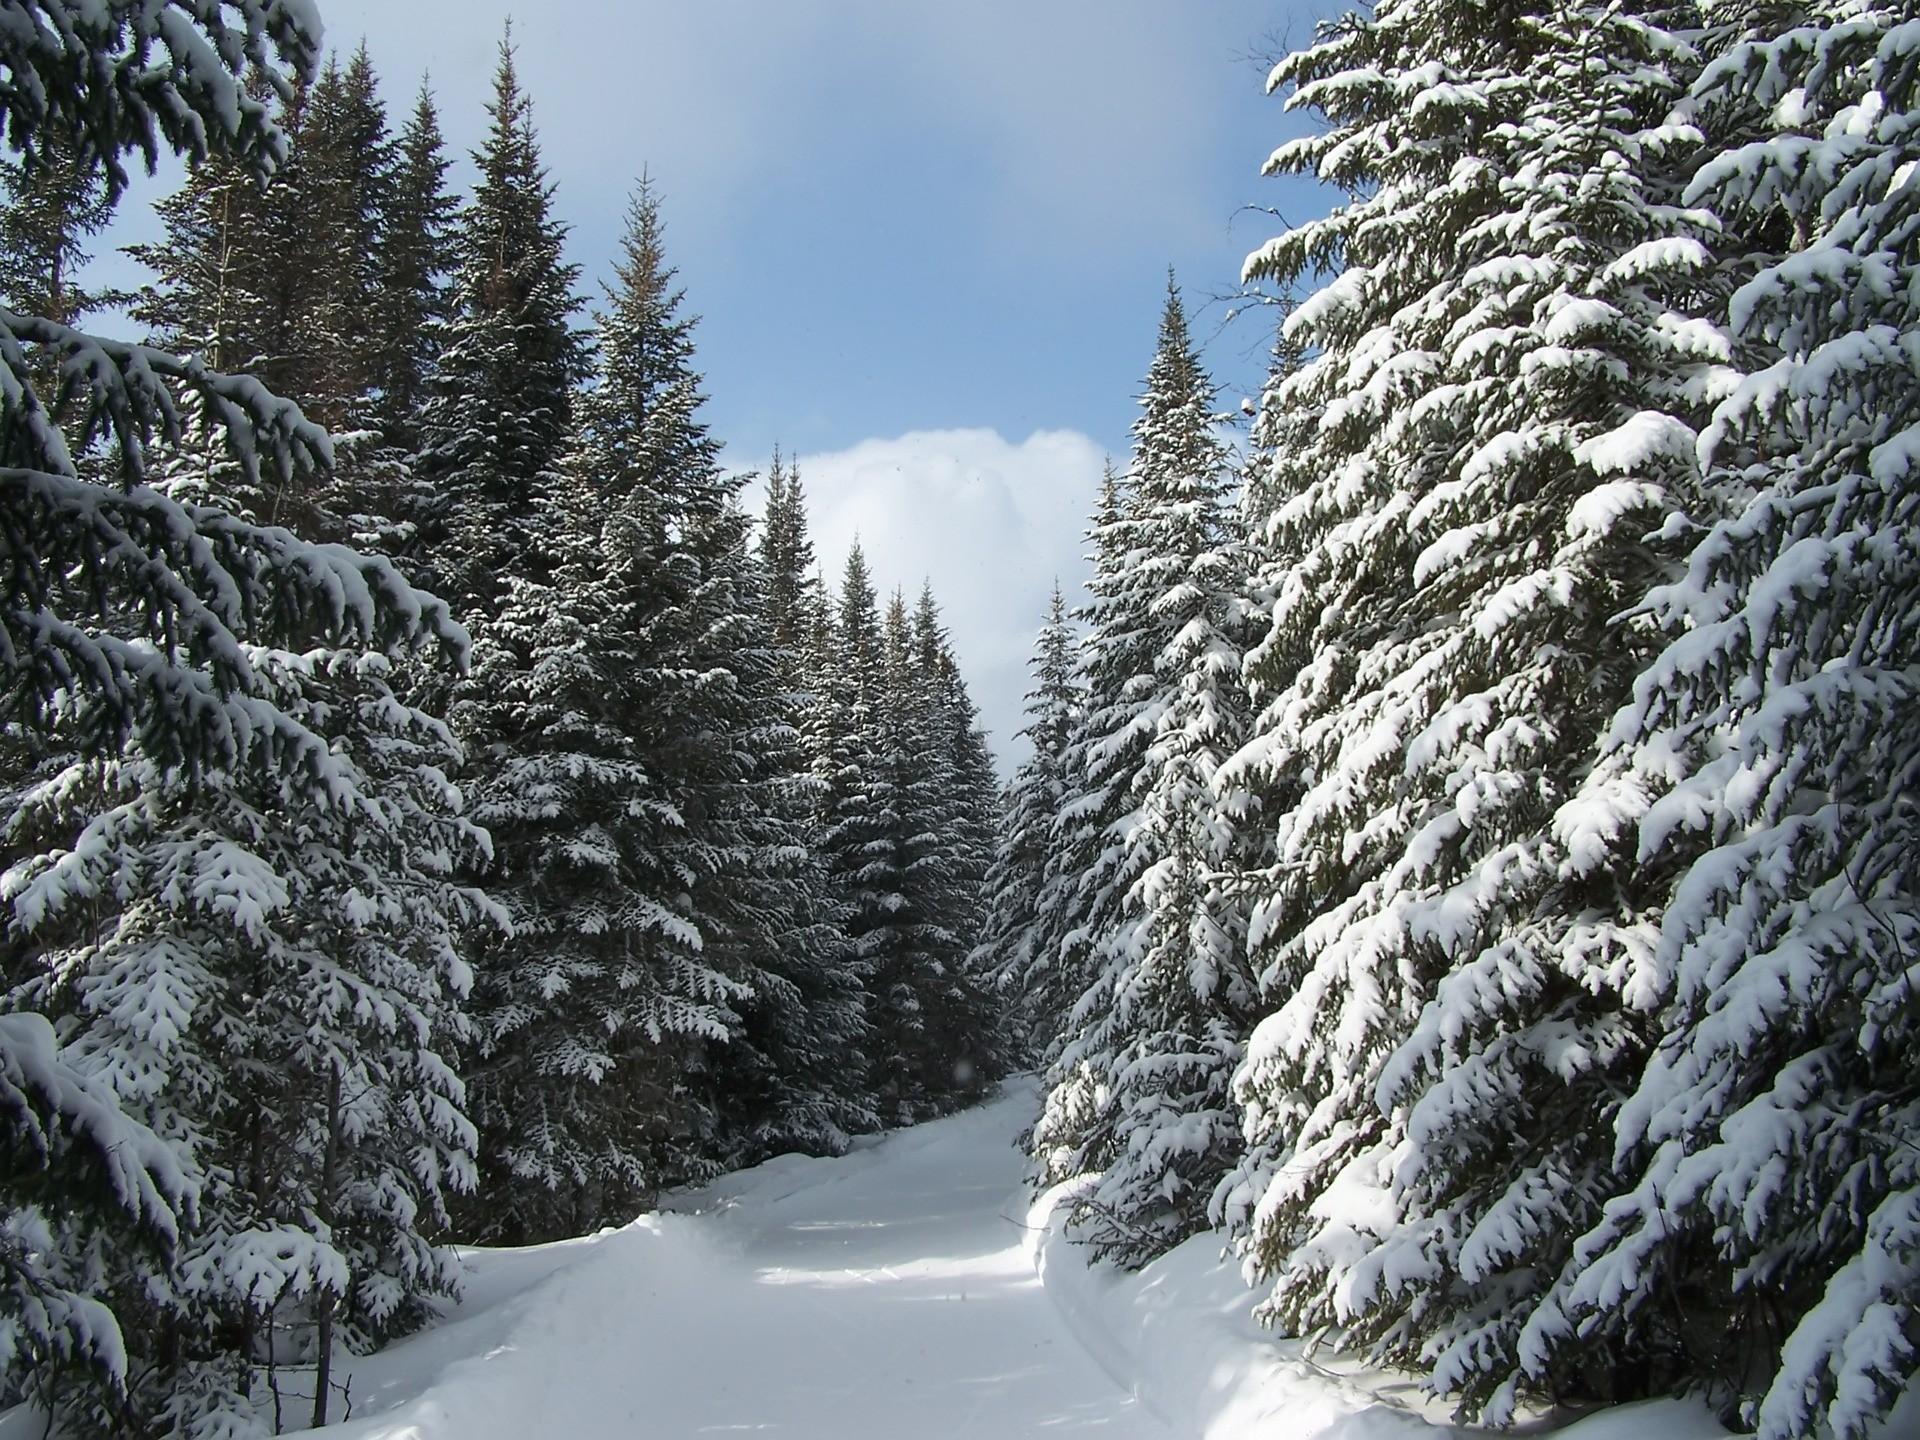 Winter Nature Wallpaper ·①